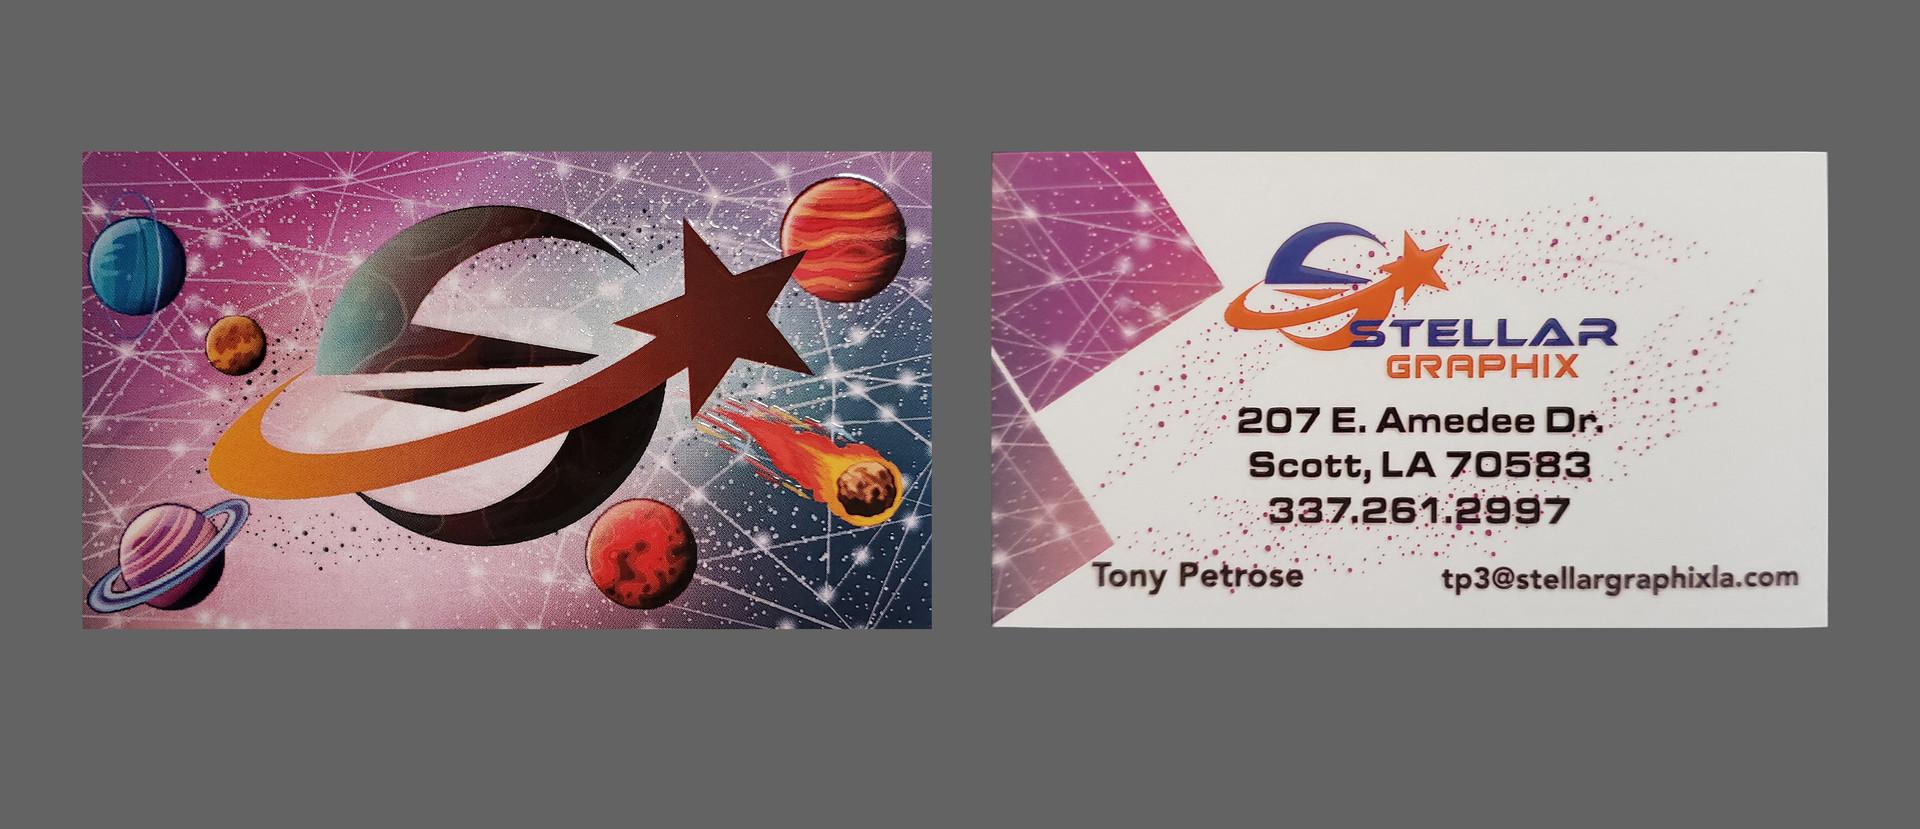 Stellar Graphix Tony 2.jpg